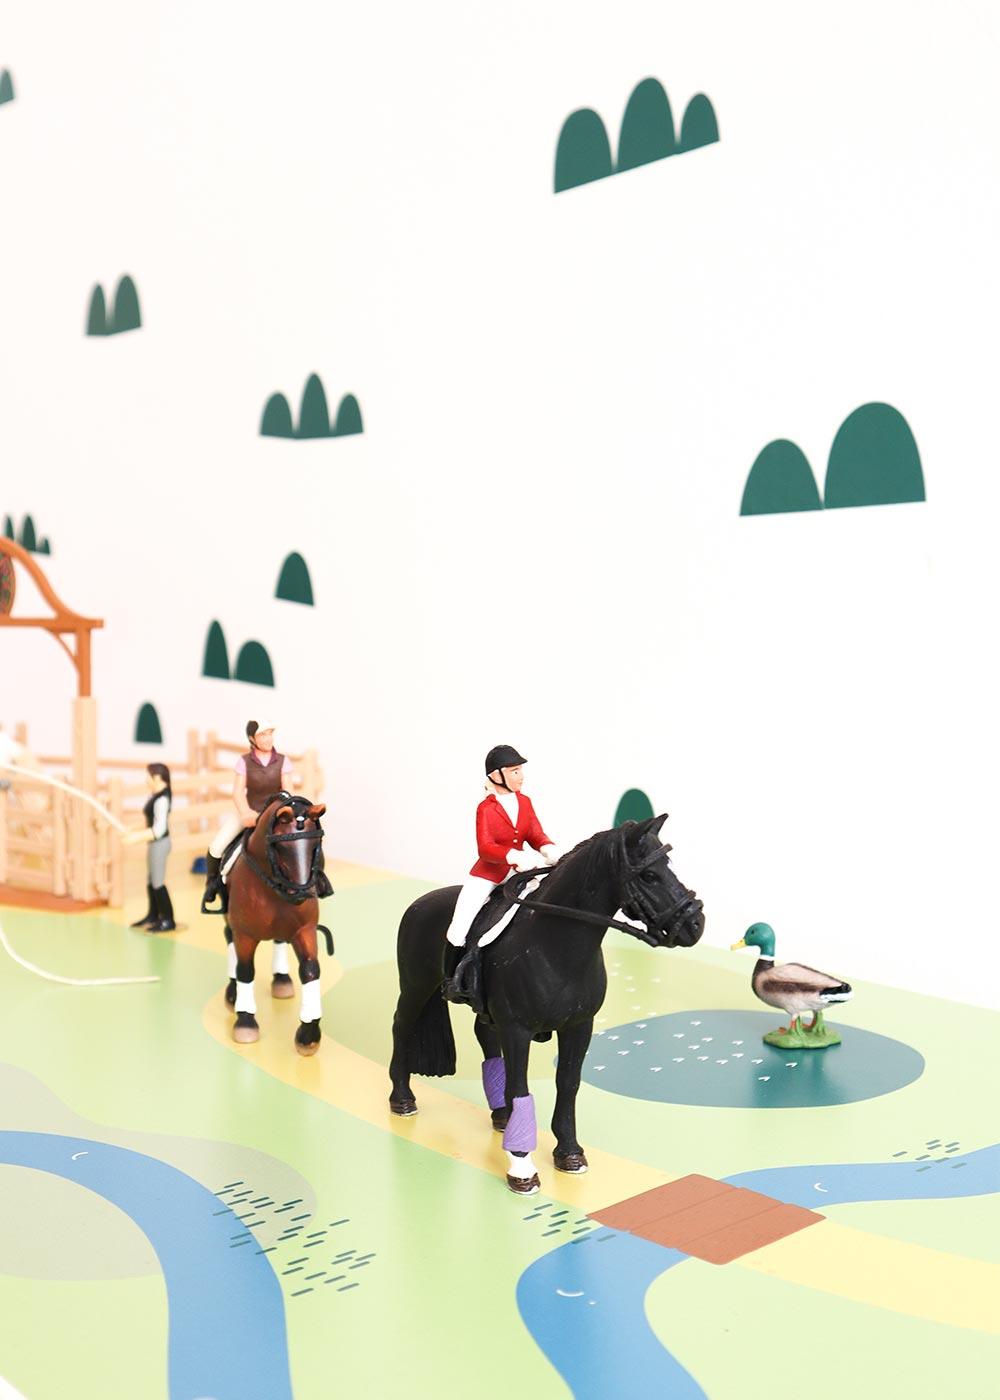 Ikea Kritter Kindertisch Spielwiese Pferd